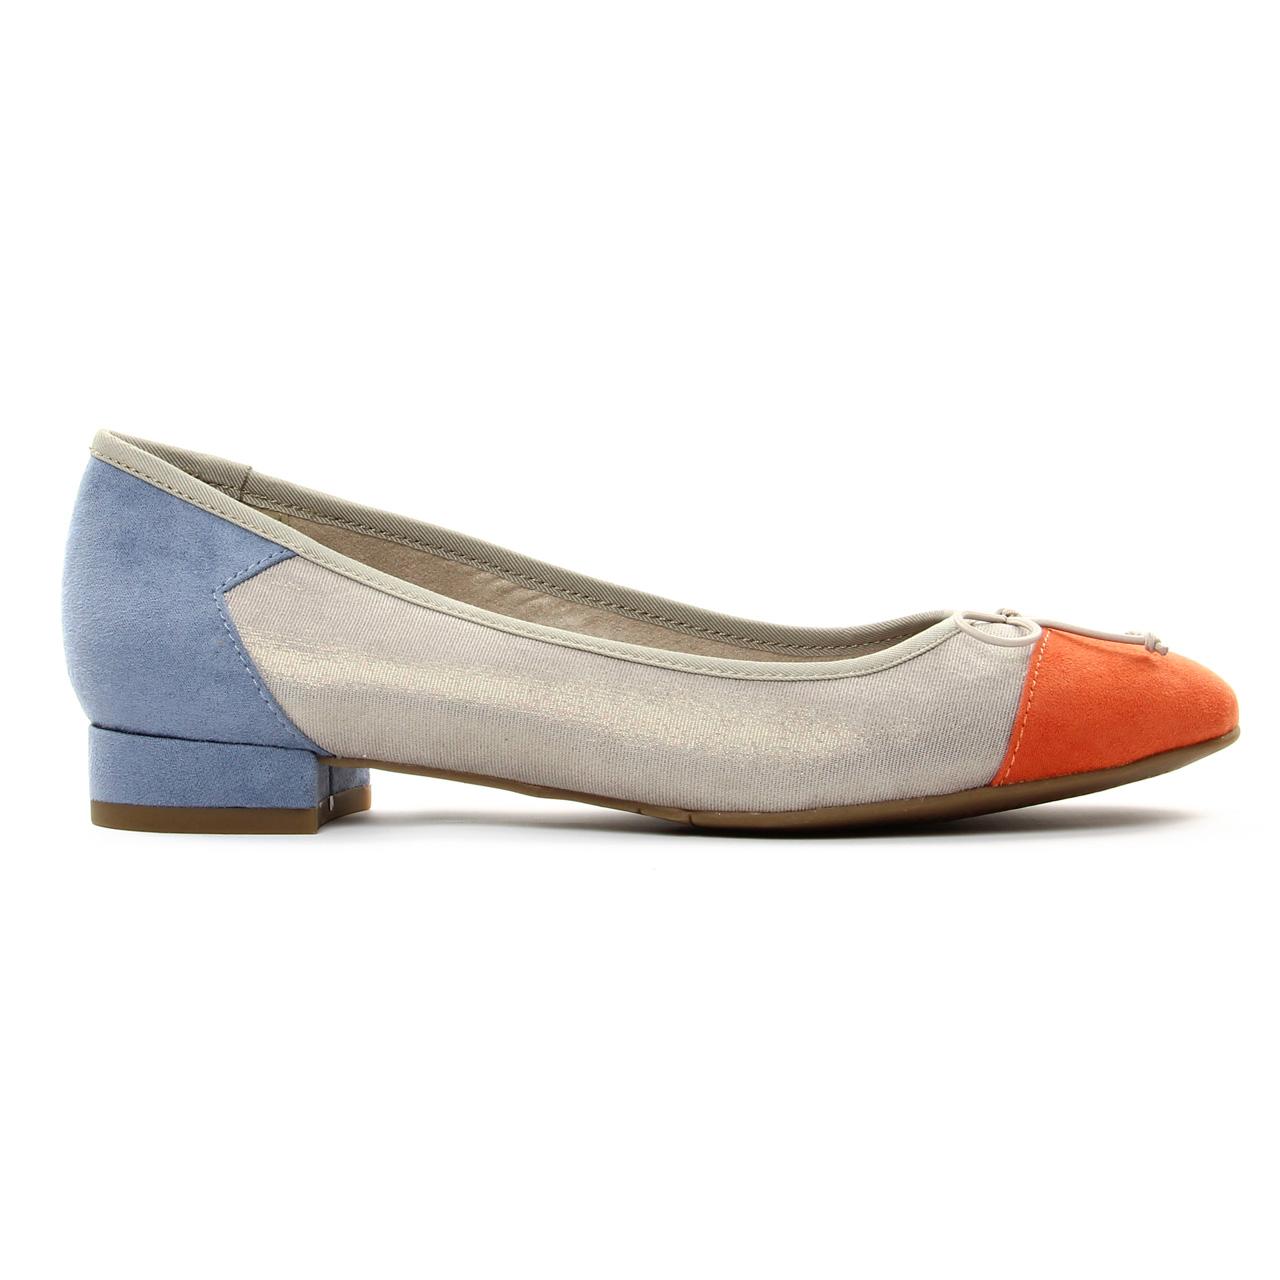 Tamaris 22100 Cloud | ballerine confort orange argent bleu